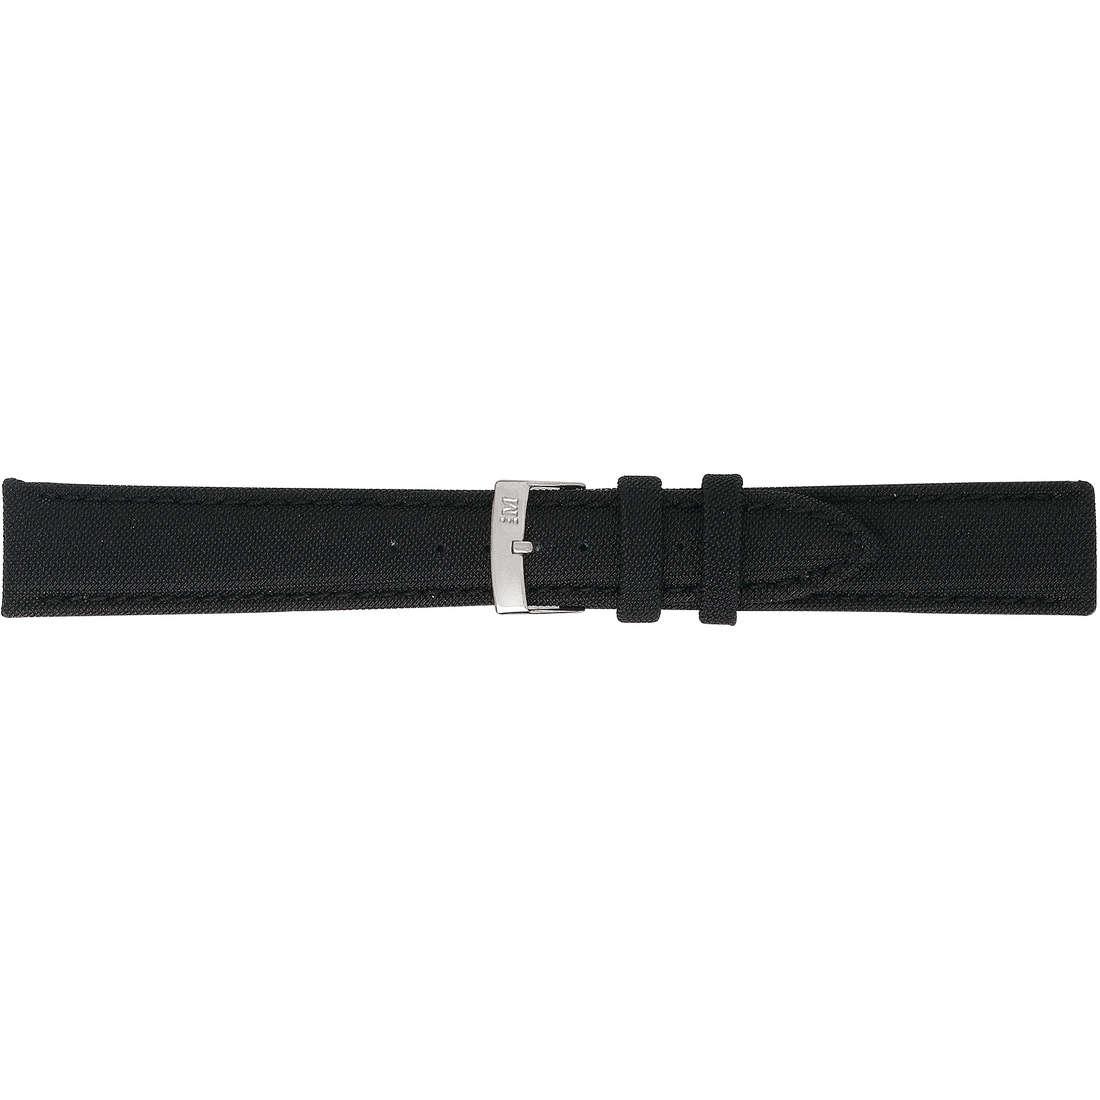 watch watch bands watch straps man Morellato Linea Sport A01X2778841019CR20